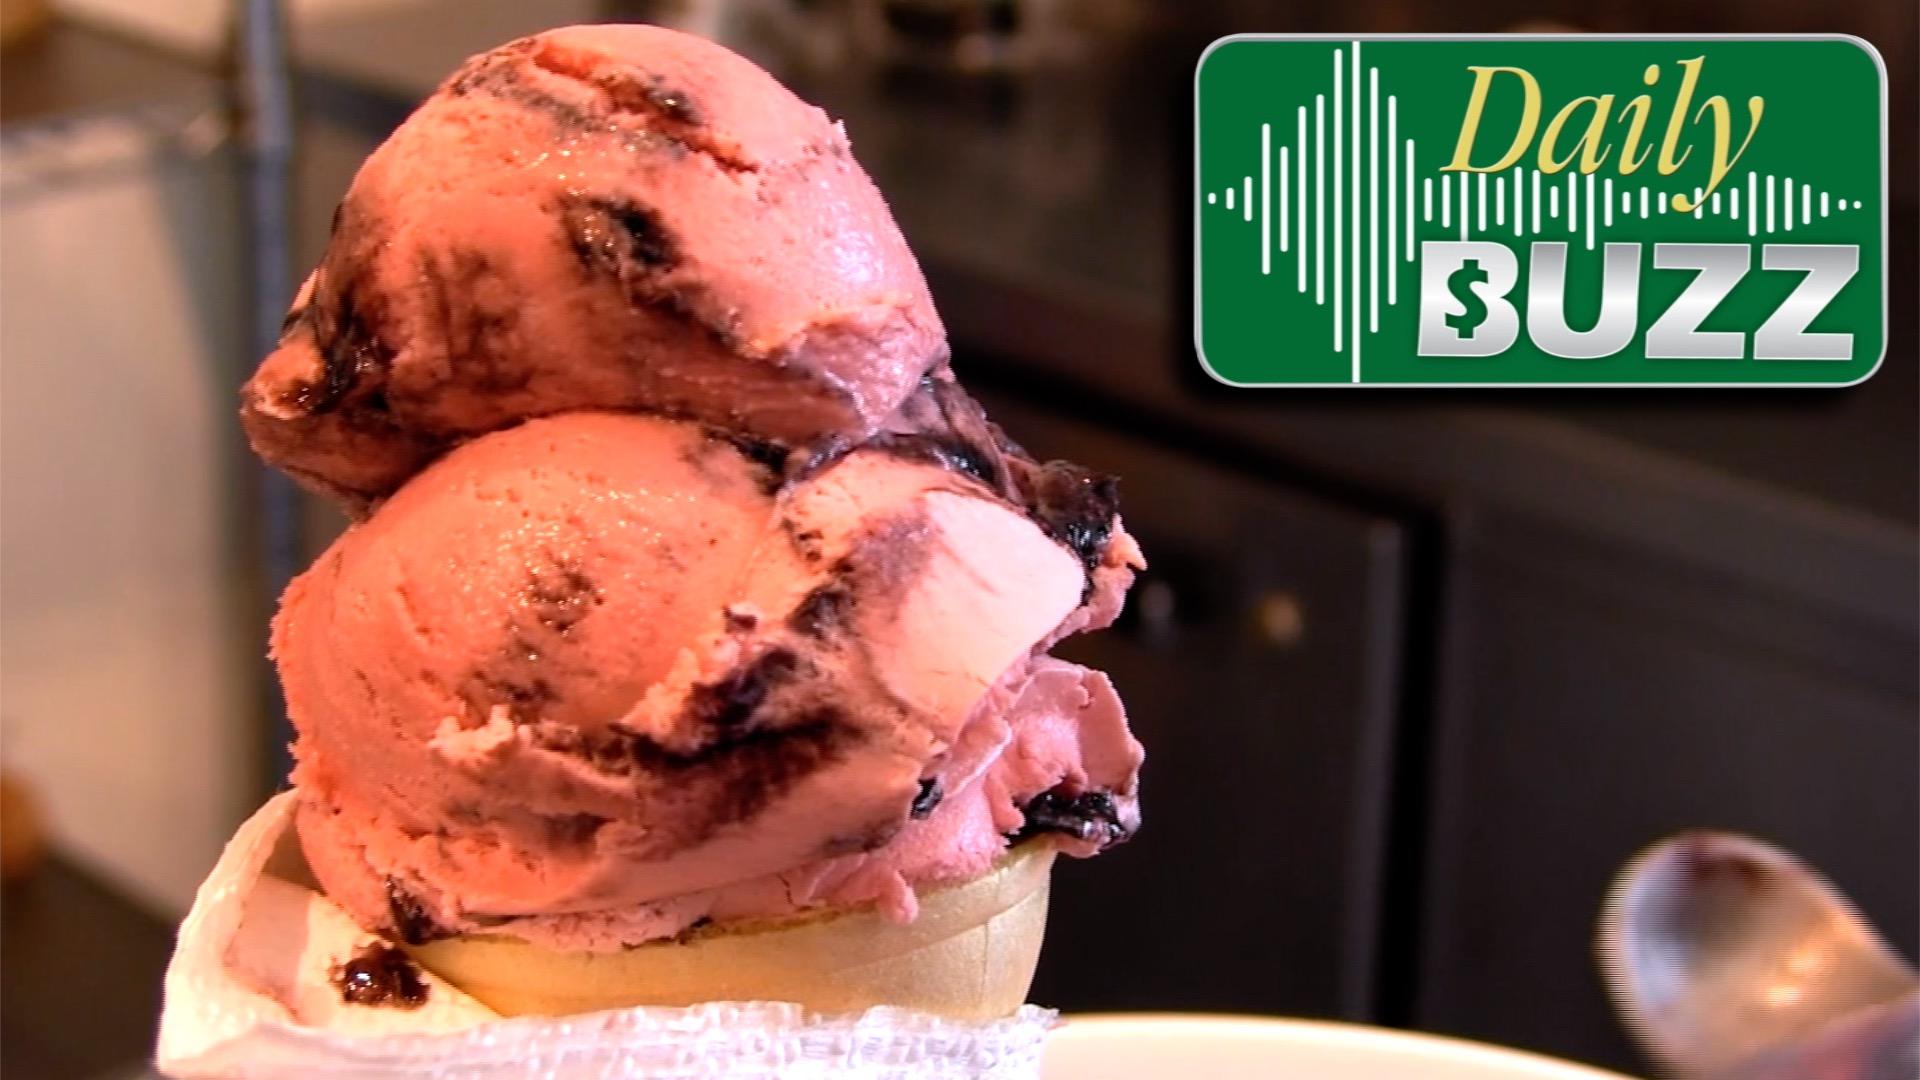 Beat the Summer Heat with Ice Cream